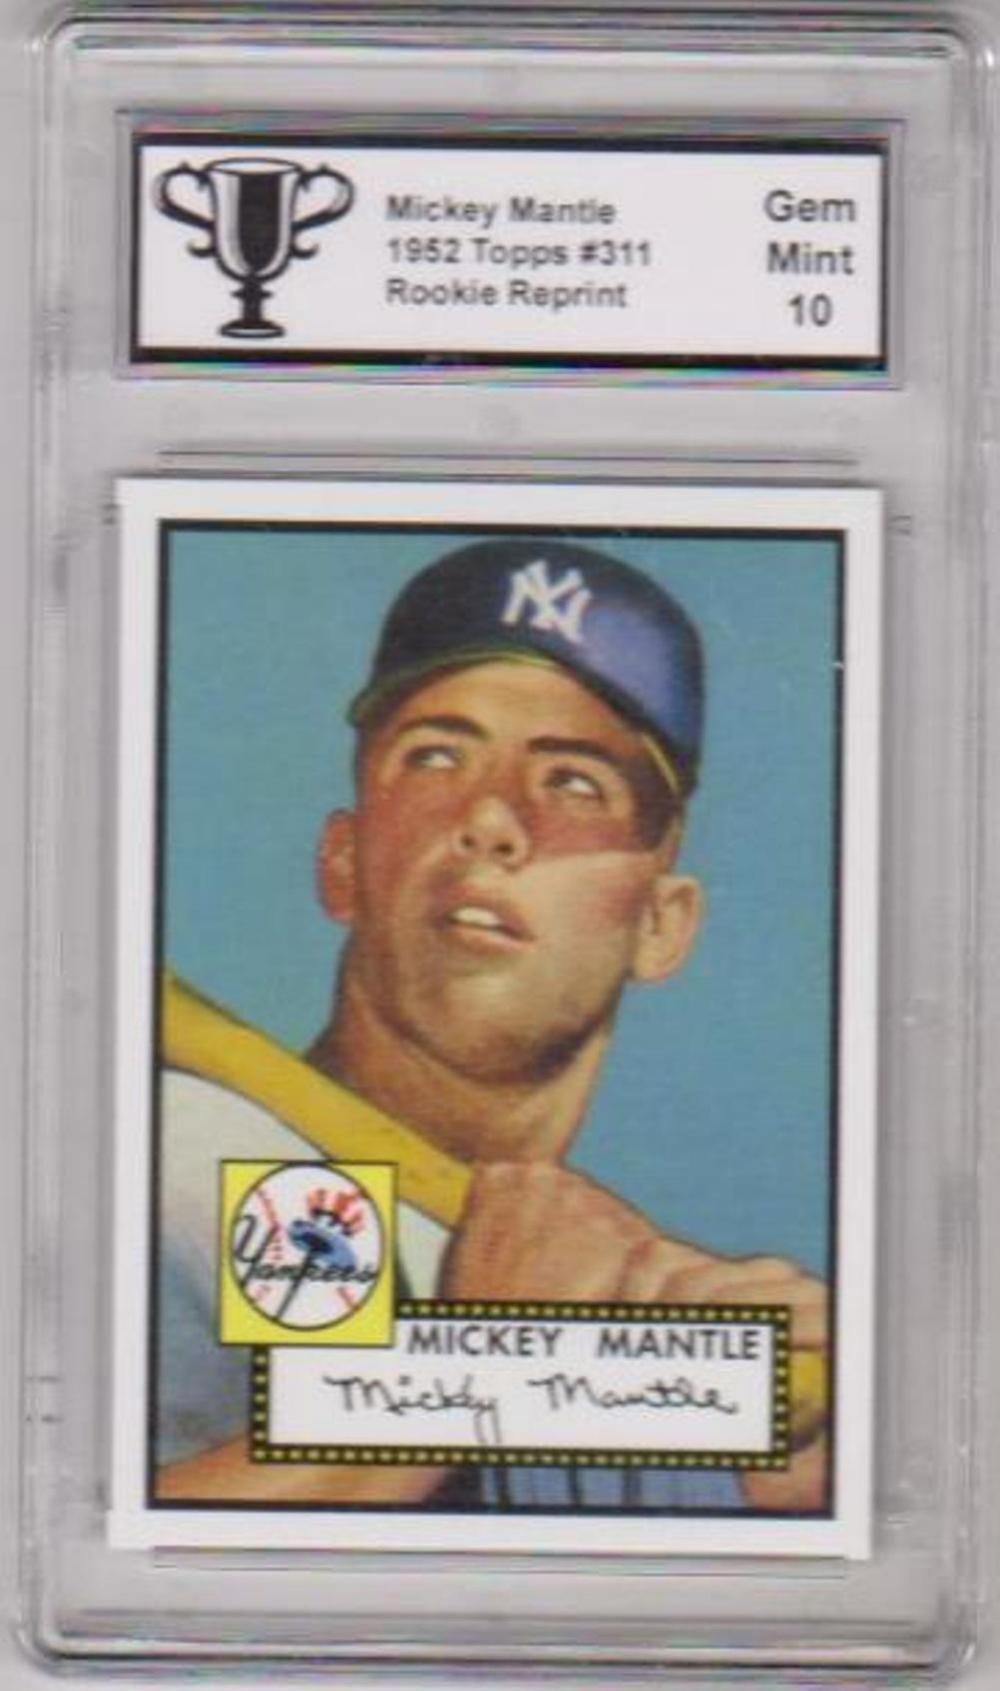 Graded Gem Mint 10 Mickey Mantle 1952 Topps 311 Topps 195